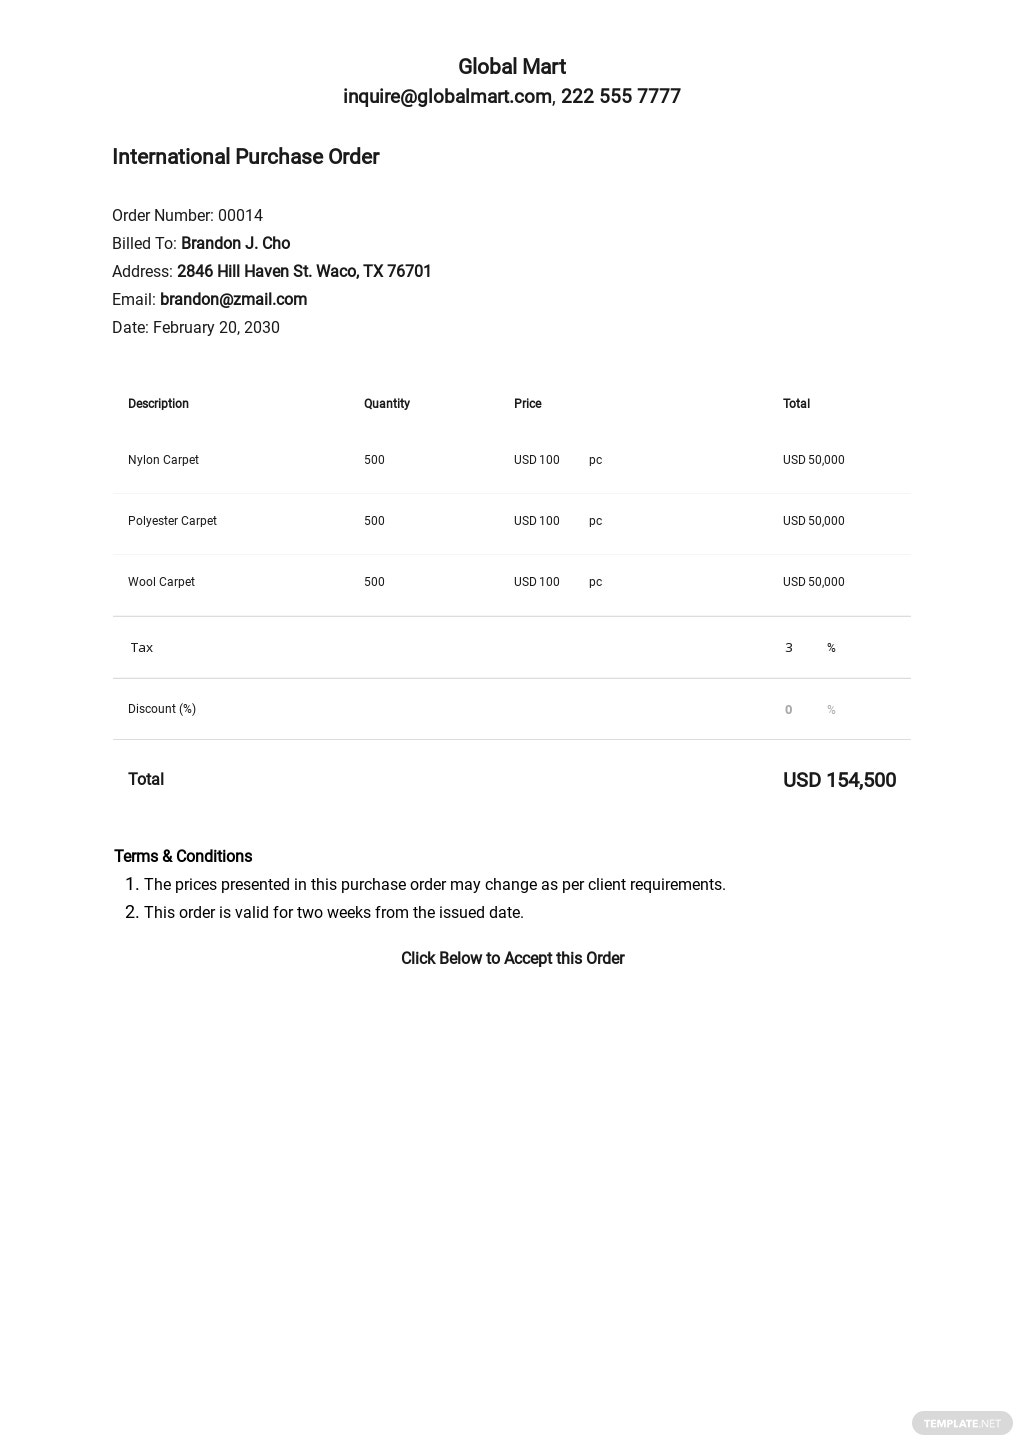 Free International Purchase Order Template.jpe